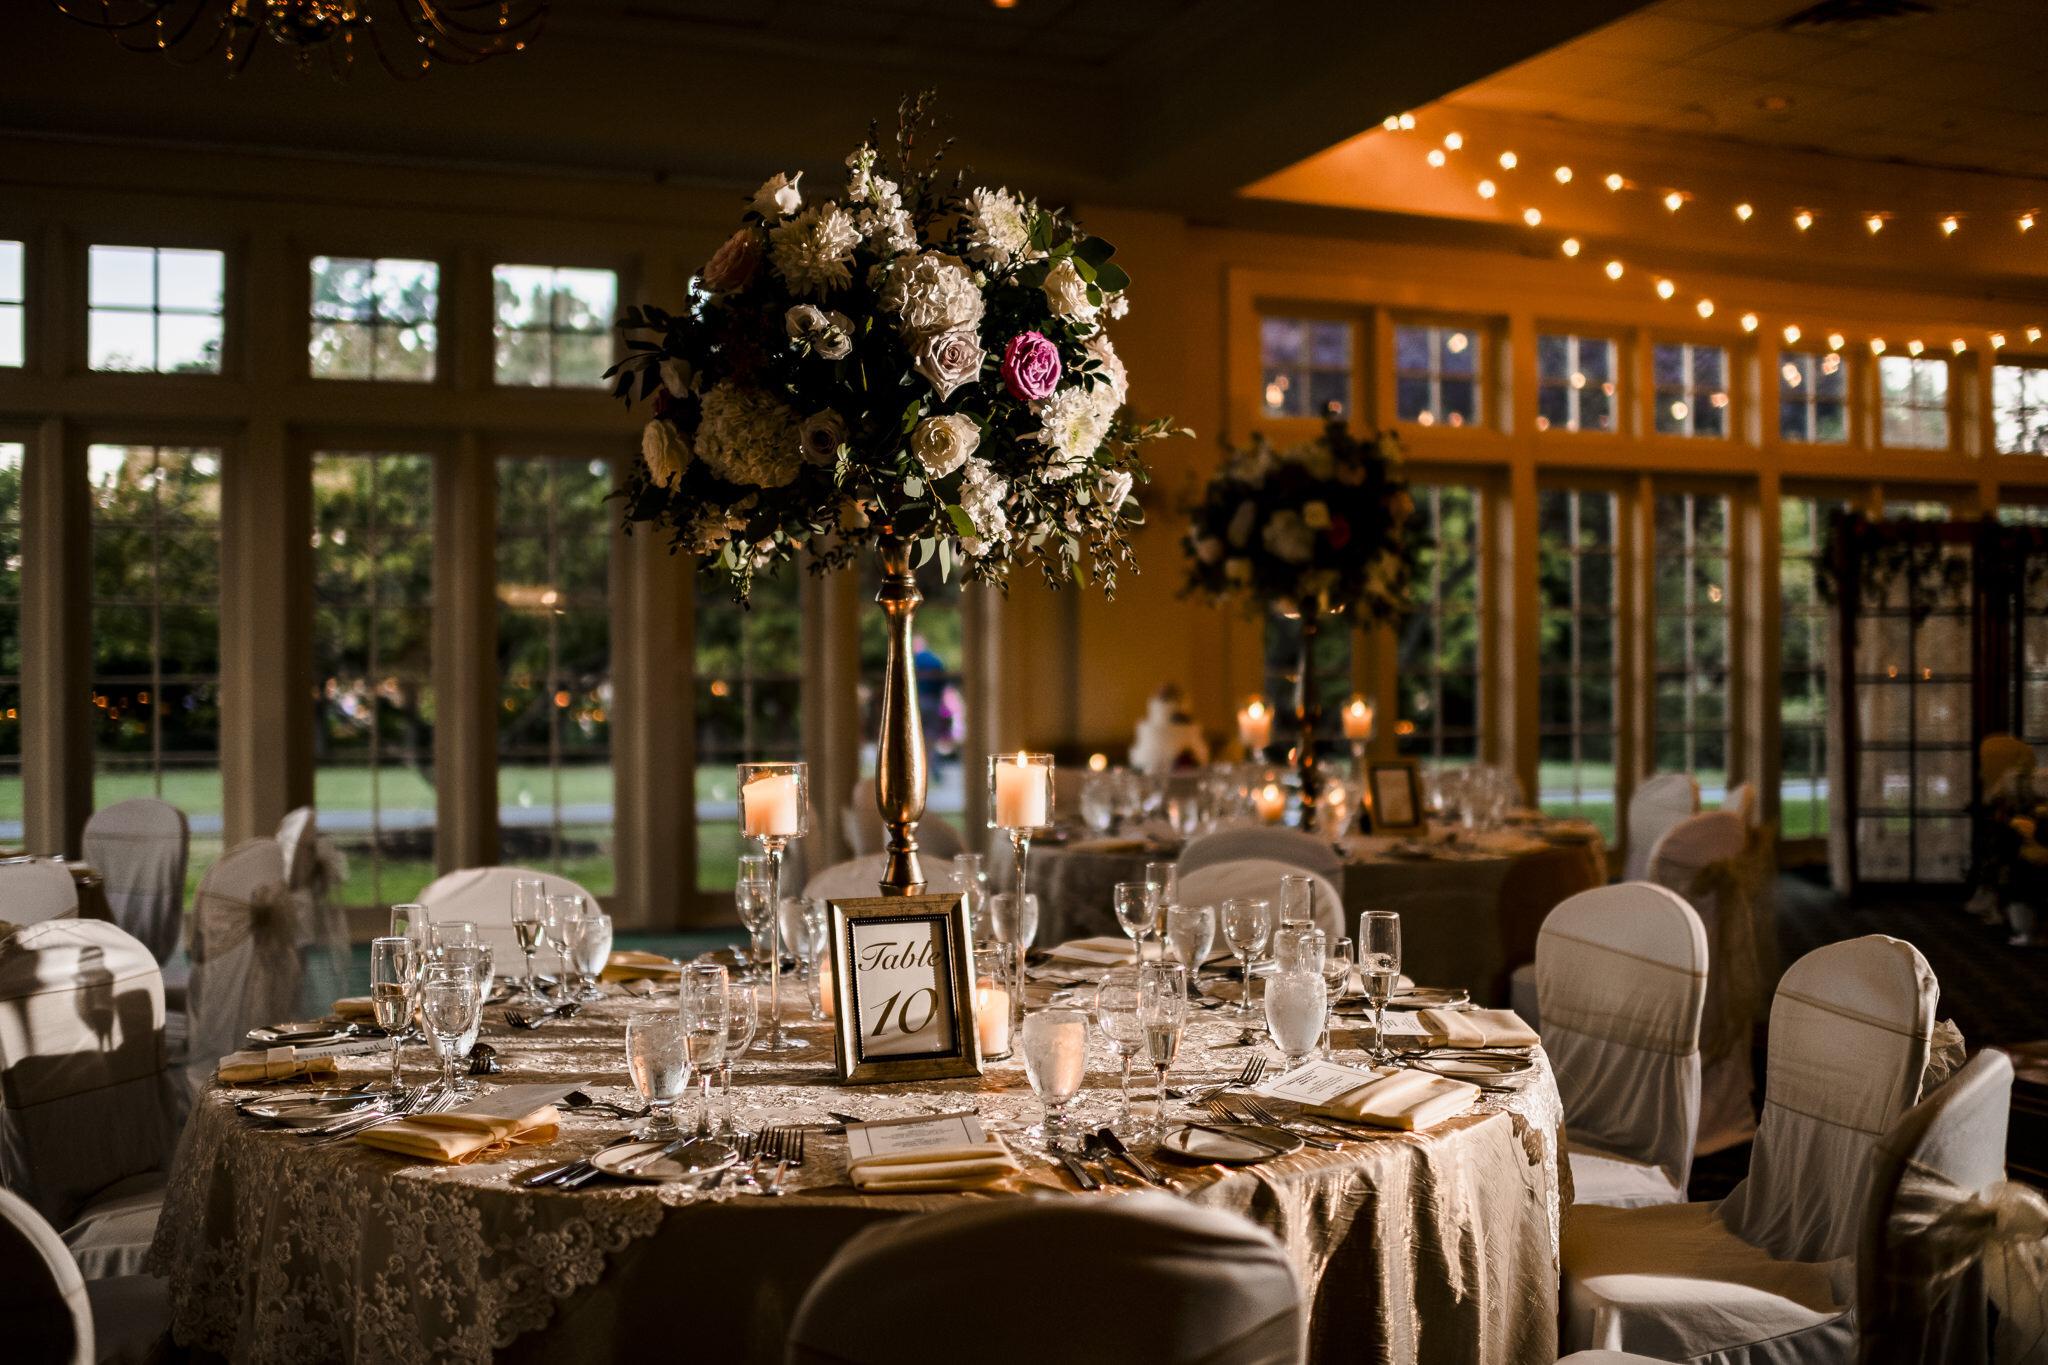 Coyle-Forsgate-Country-Club-Wedding-Photographer-34.JPG